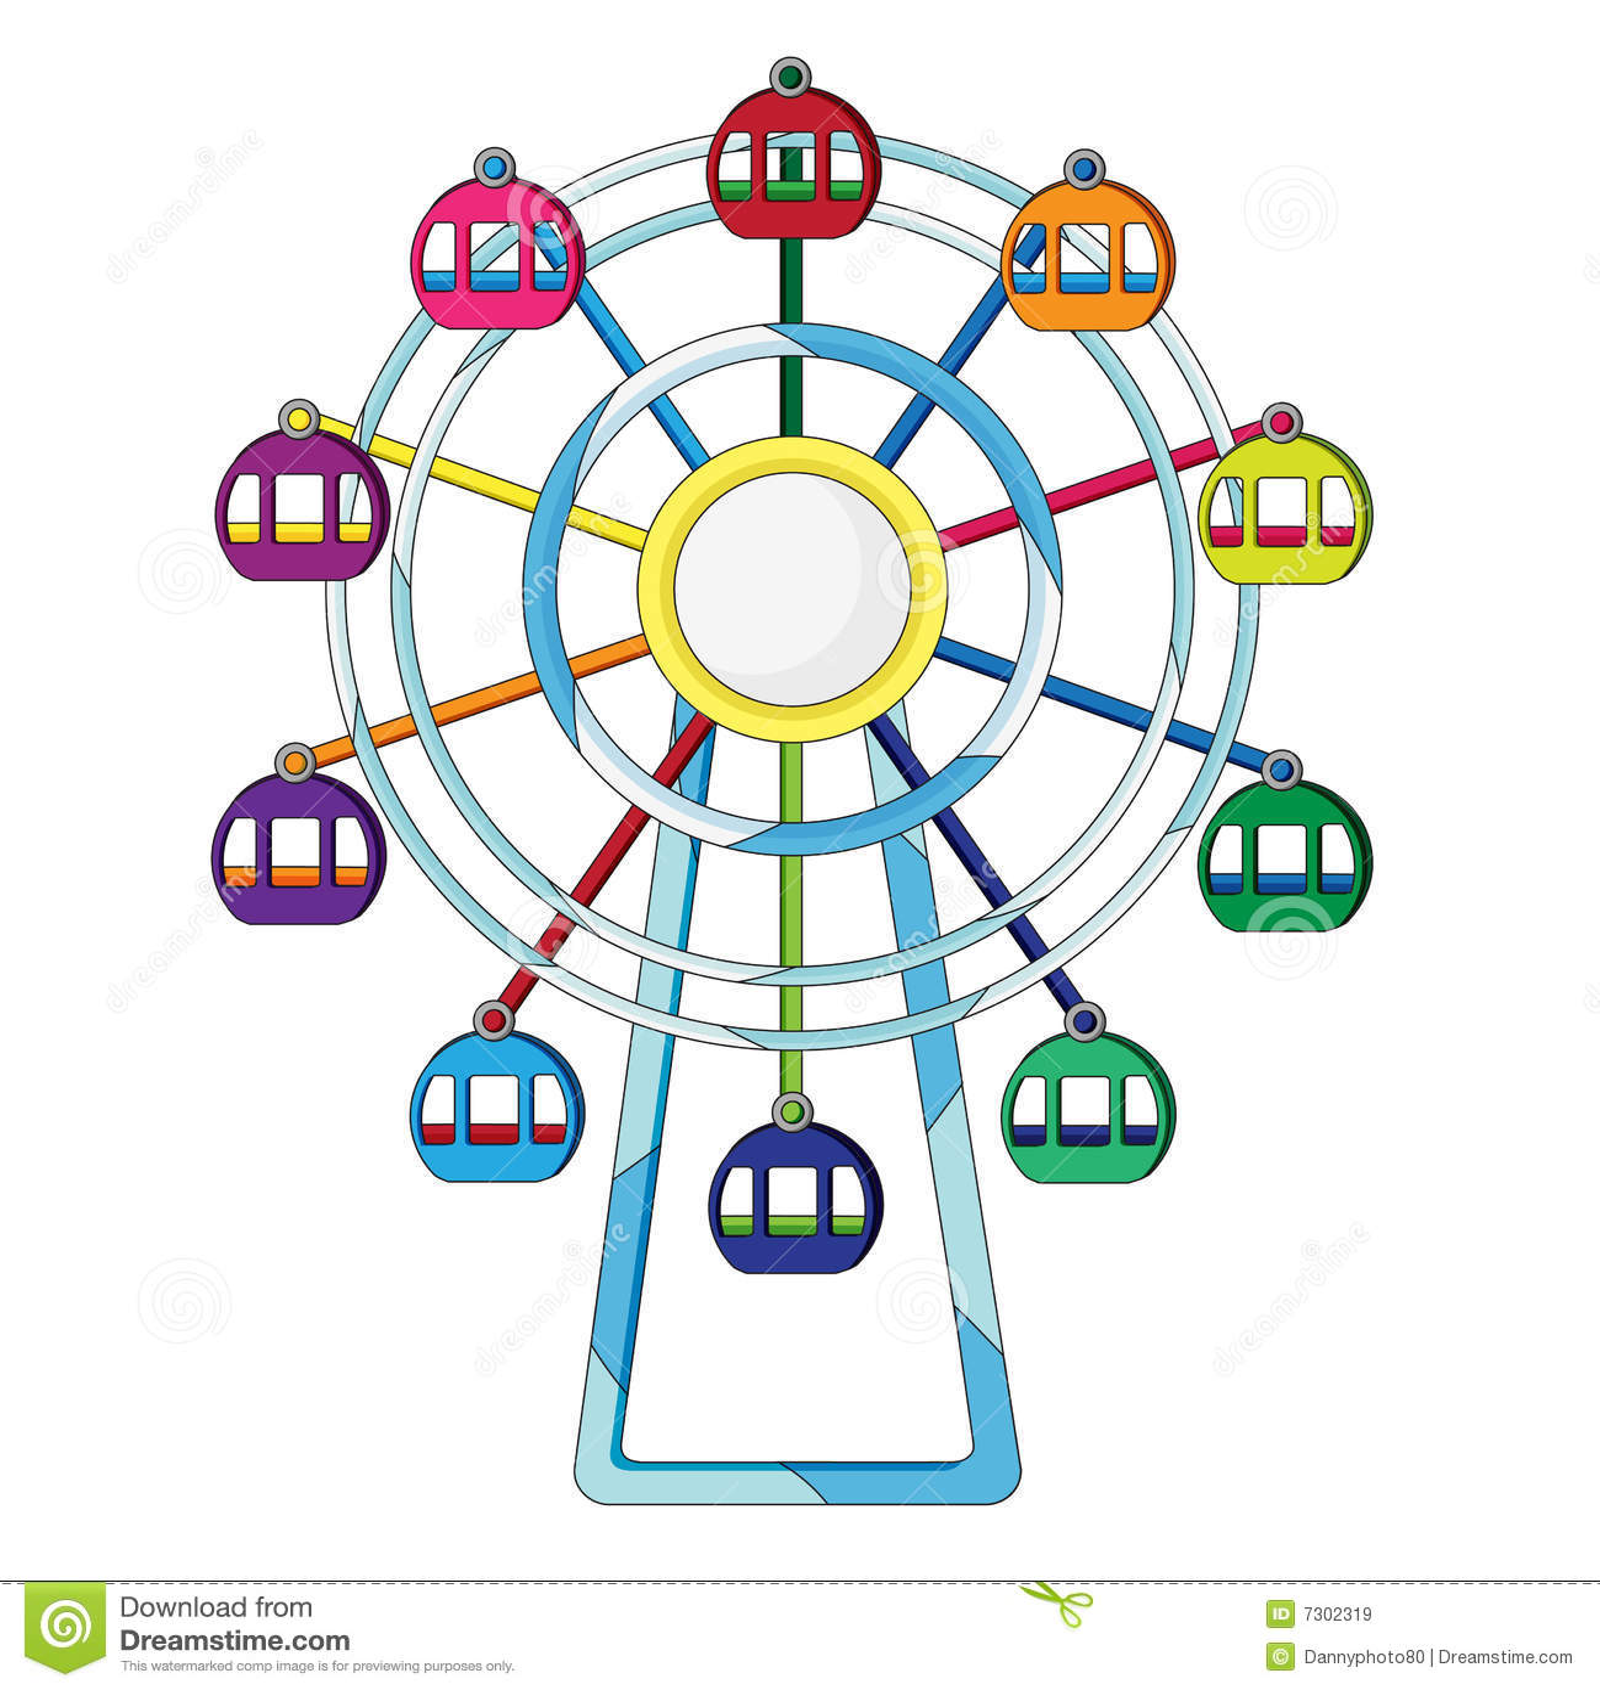 Ferris Wheel Illustration Royalty Free Stock Images - Image: 7302319